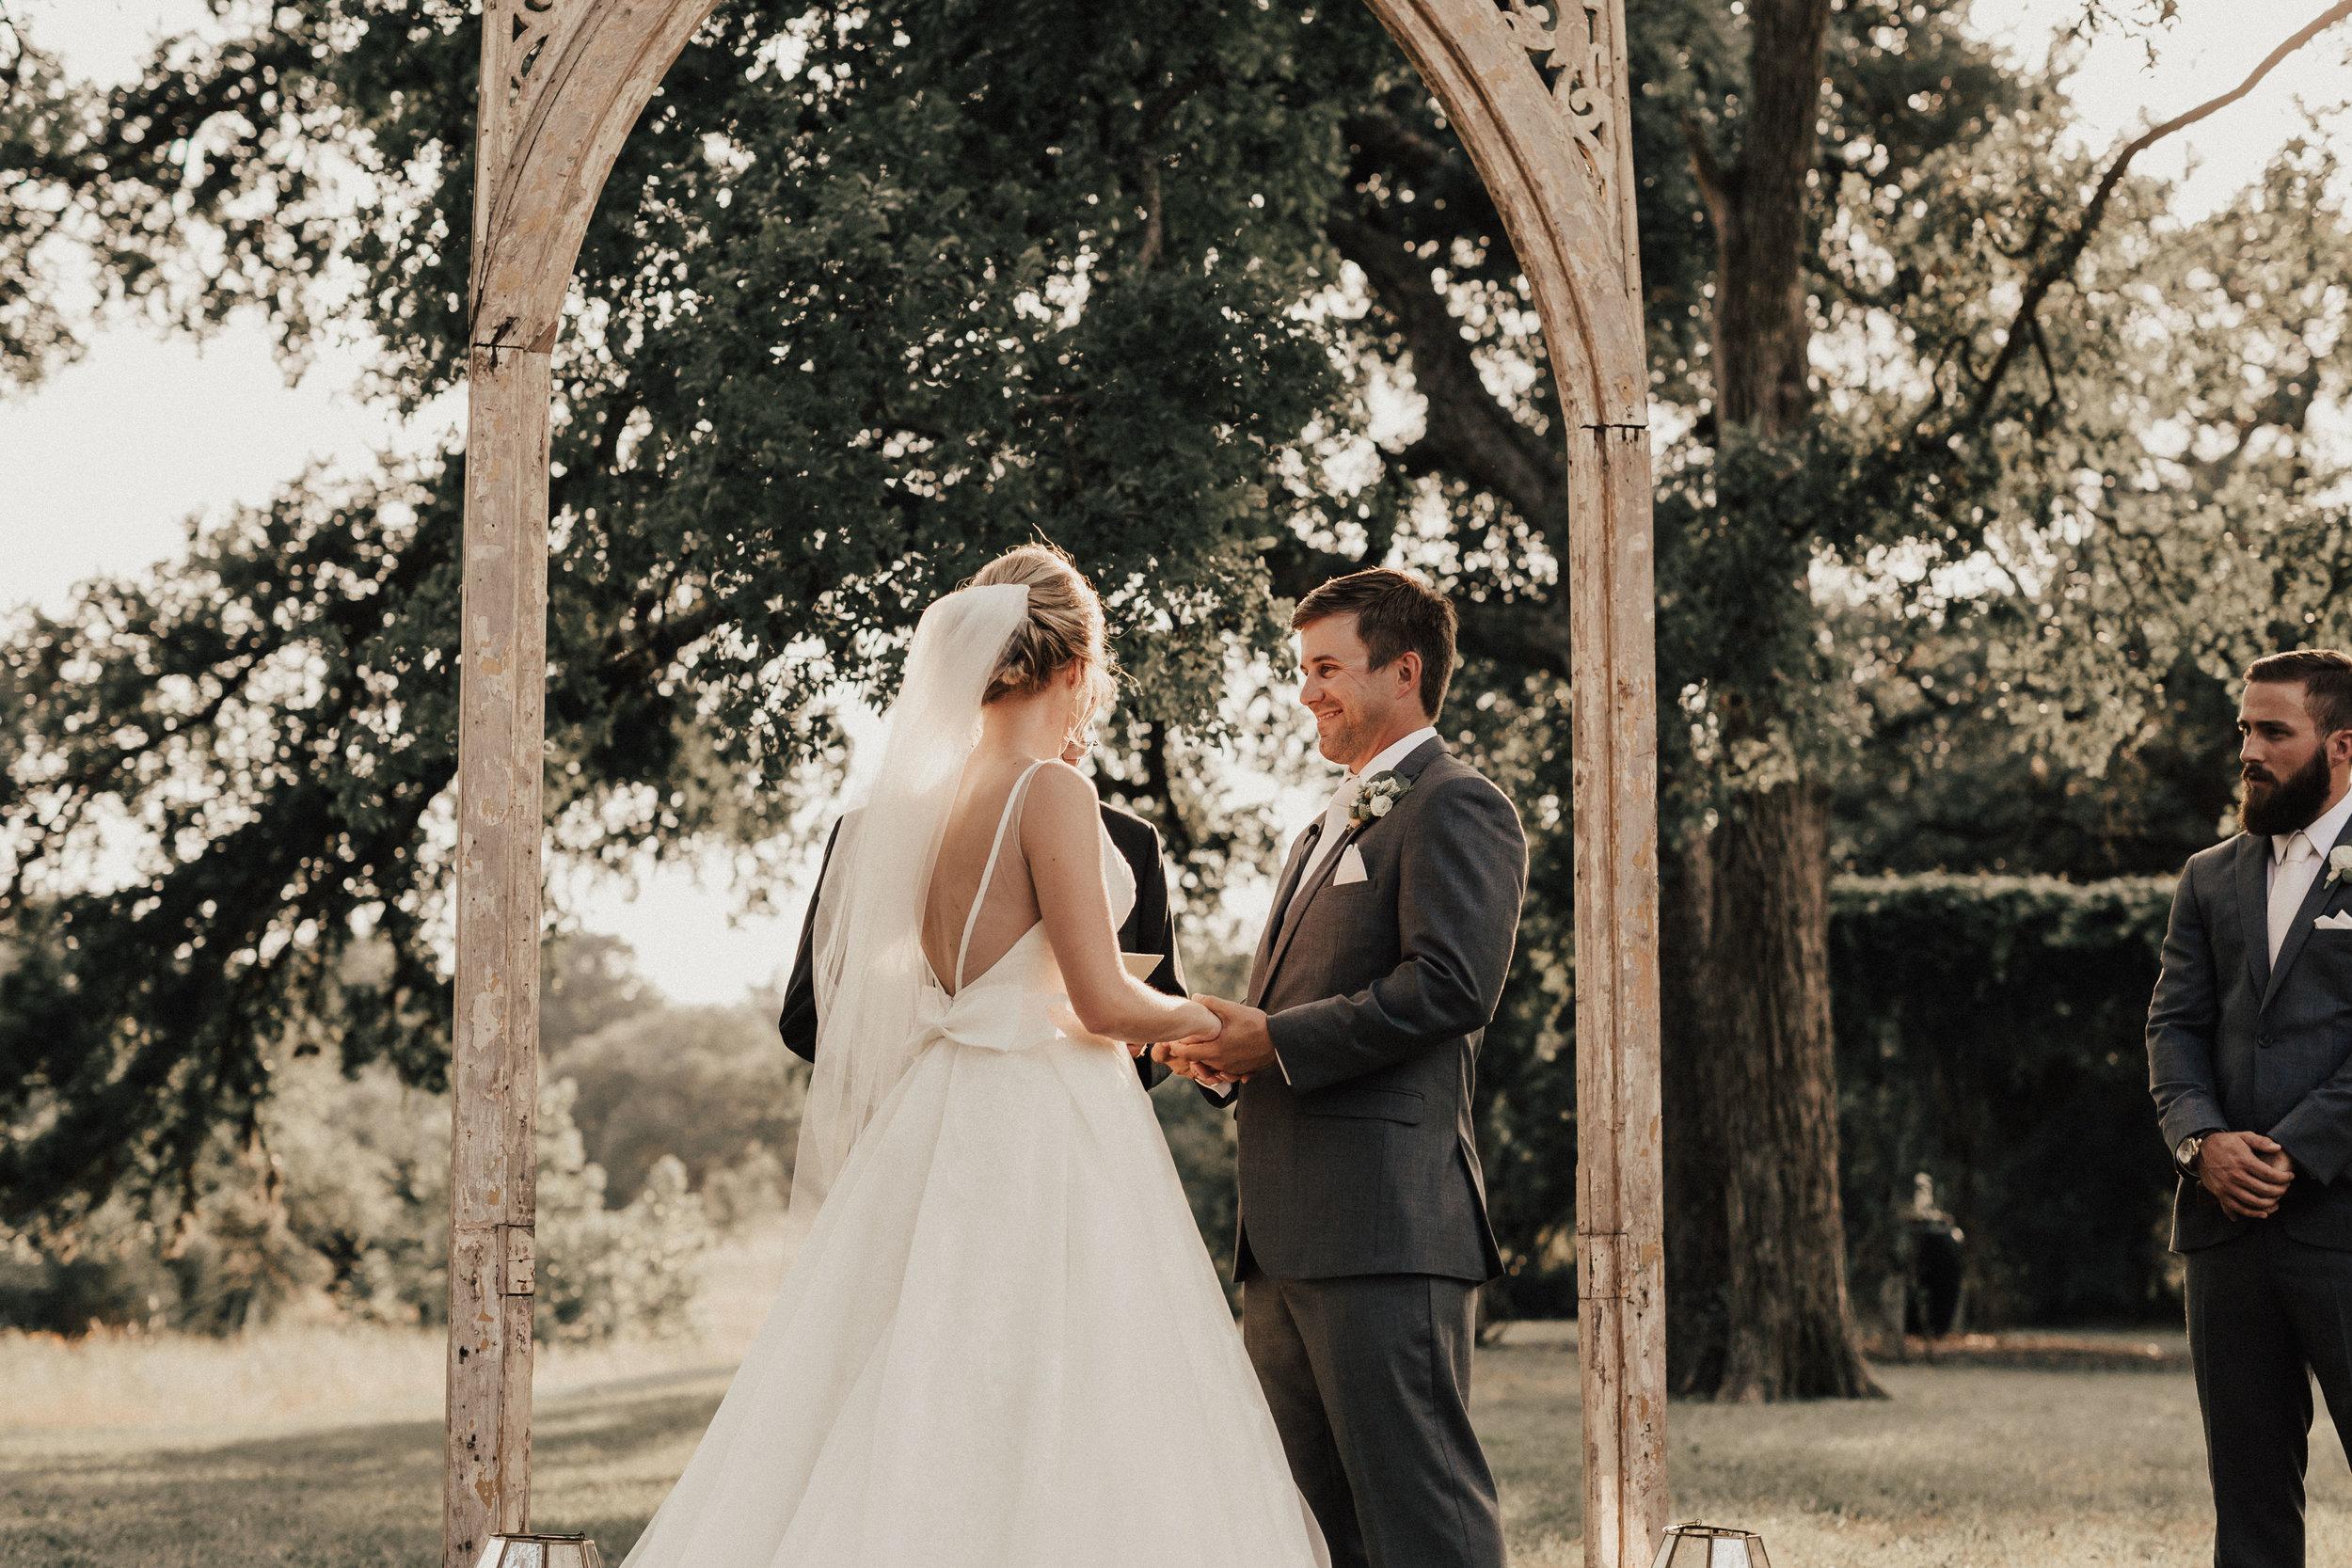 lauren-harrison-wedding-photographer-pecan-springs-ranch-austin-texas--589.jpg